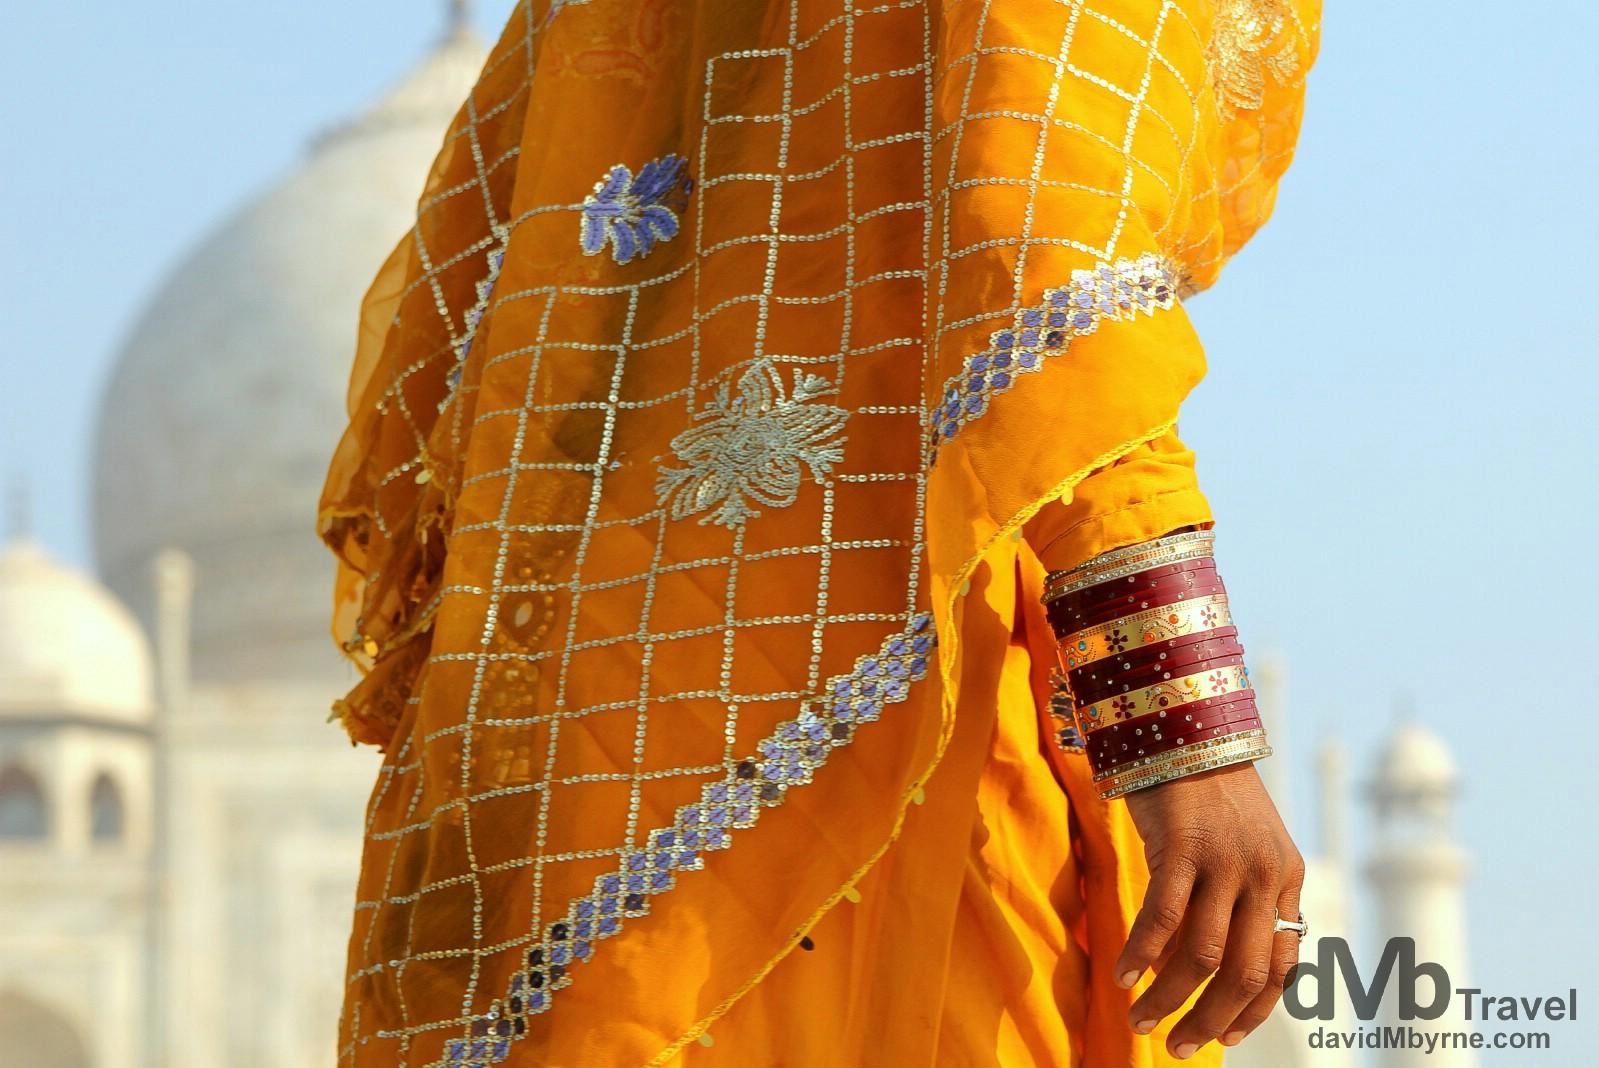 Sari at the TaJ Mahal, Agra, Uttar Pradesh, India. October 11th 2012.